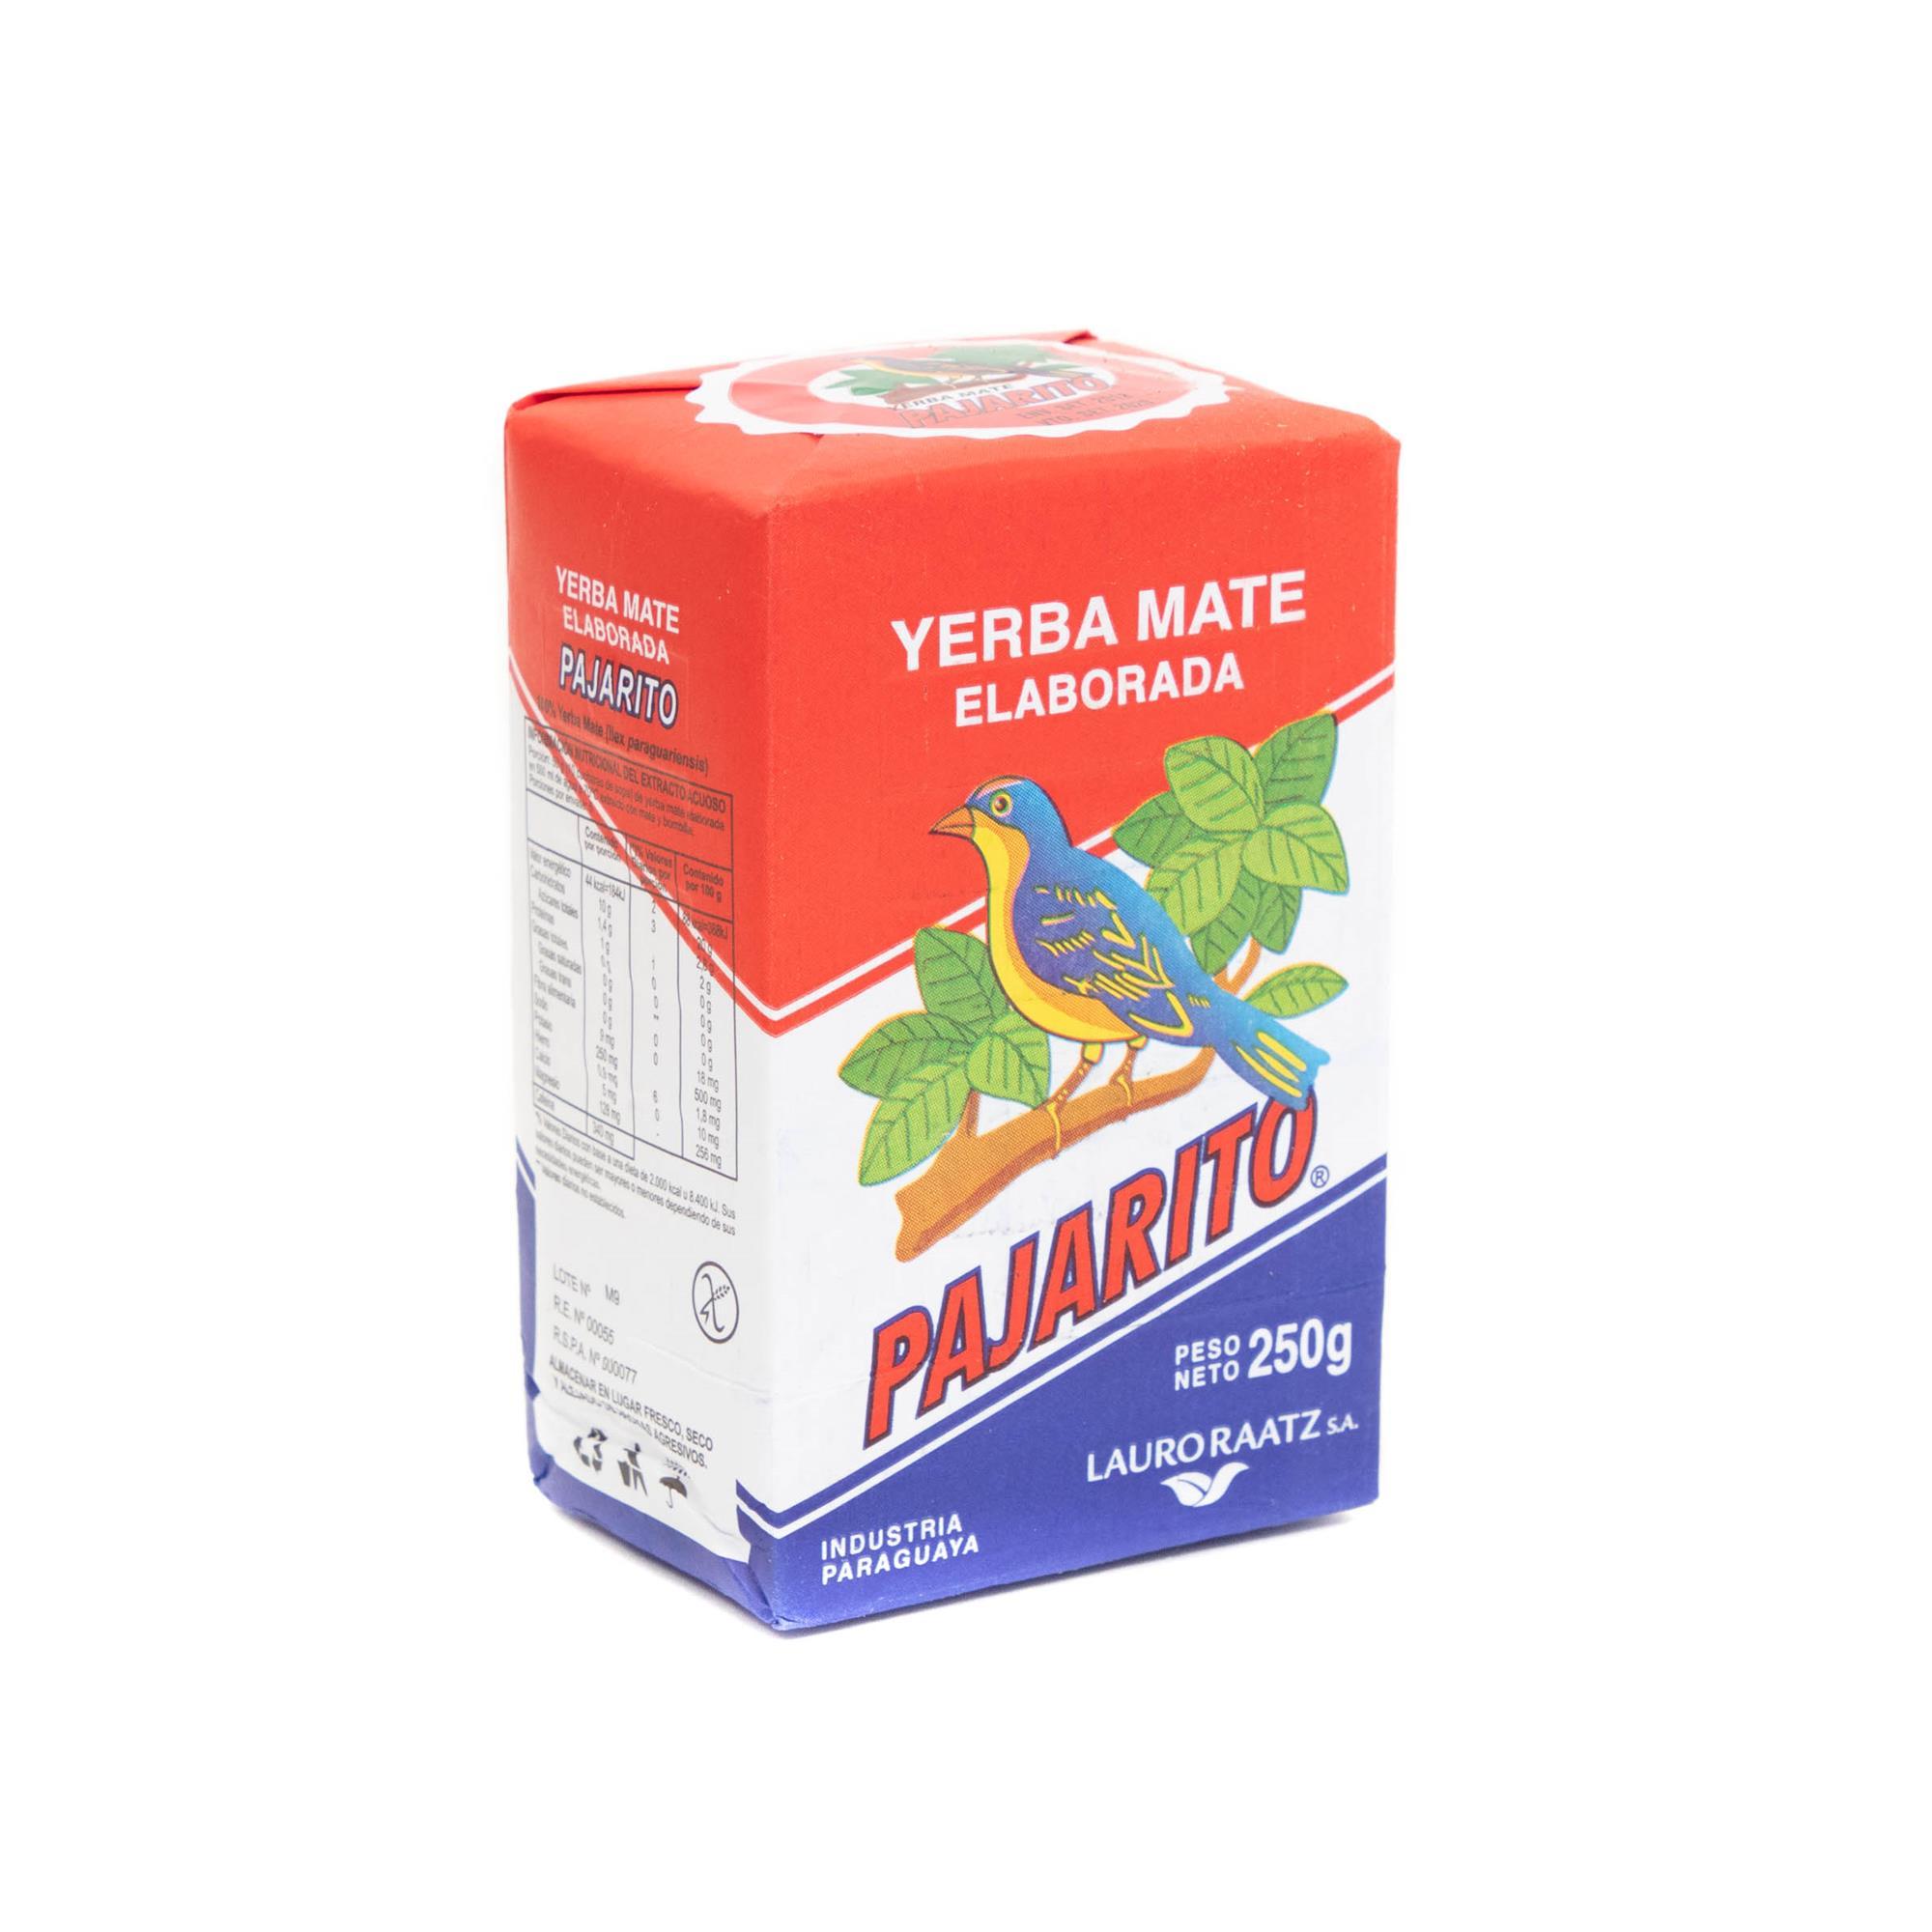 YERBA MATE PAJARITO PAQUETE 250 GR